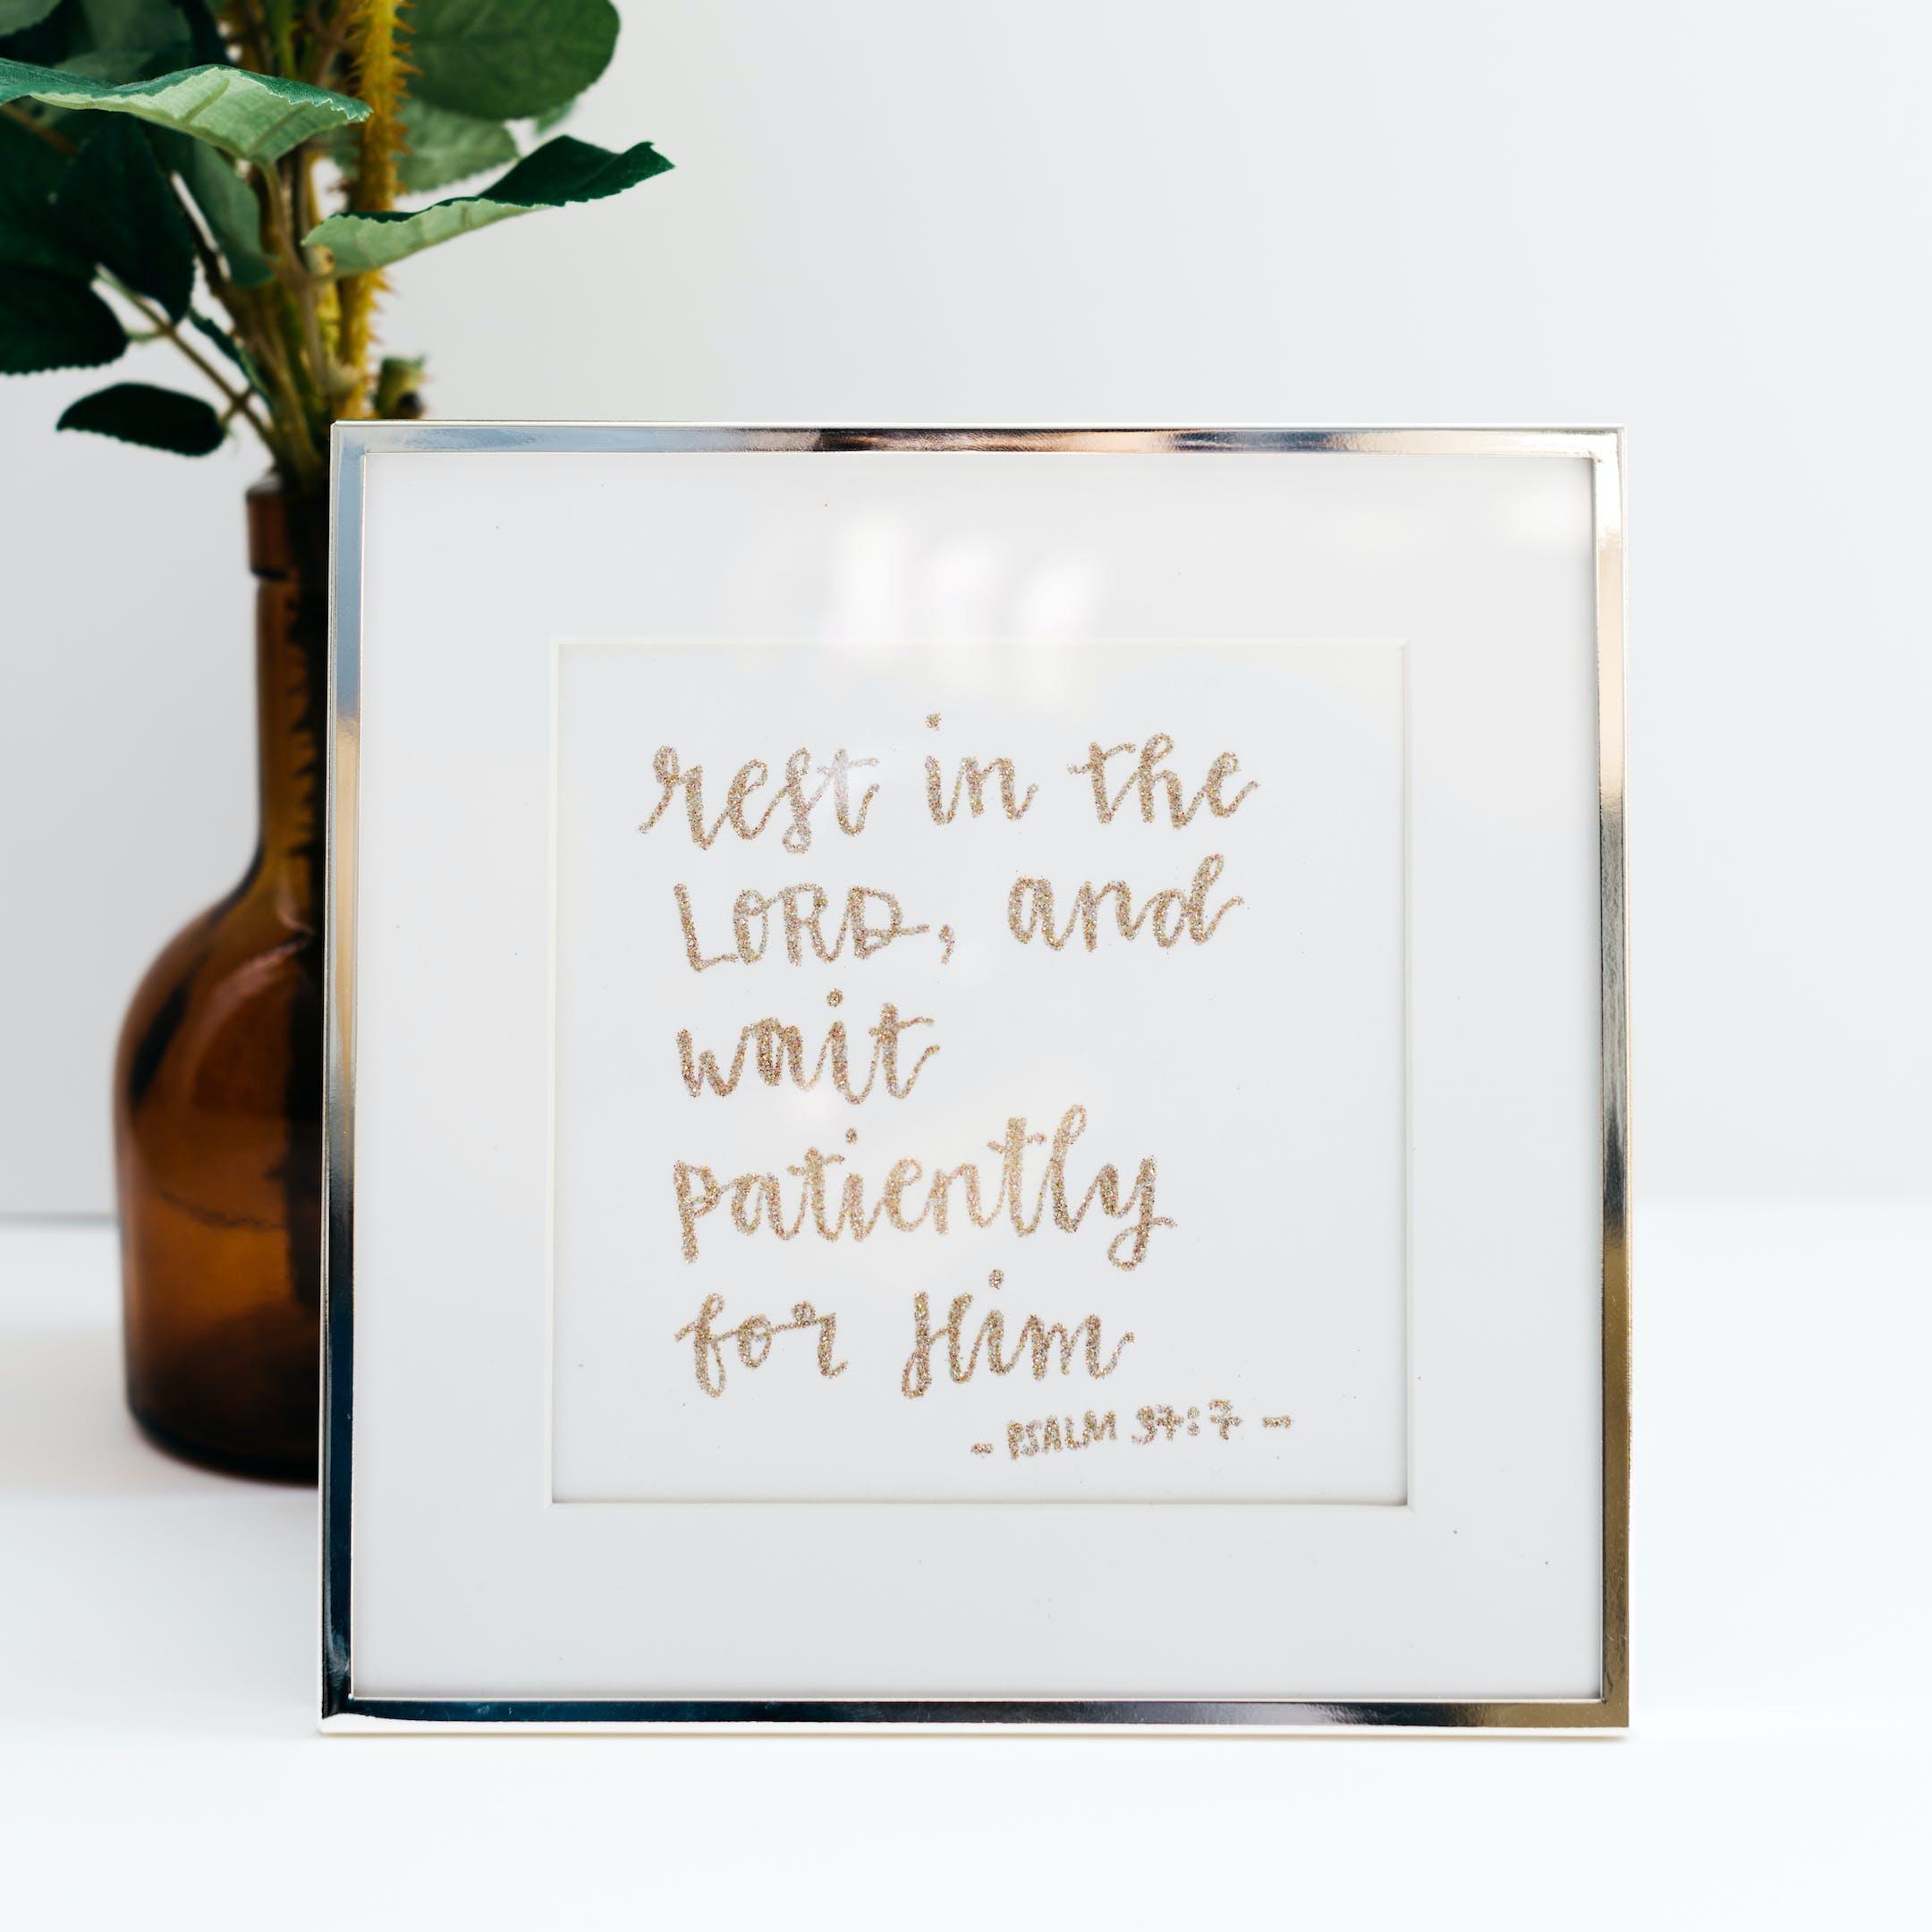 Rest In The Lord Framed Glitter Calligraphy - Psalm 37:7 - Kate Hanks Art